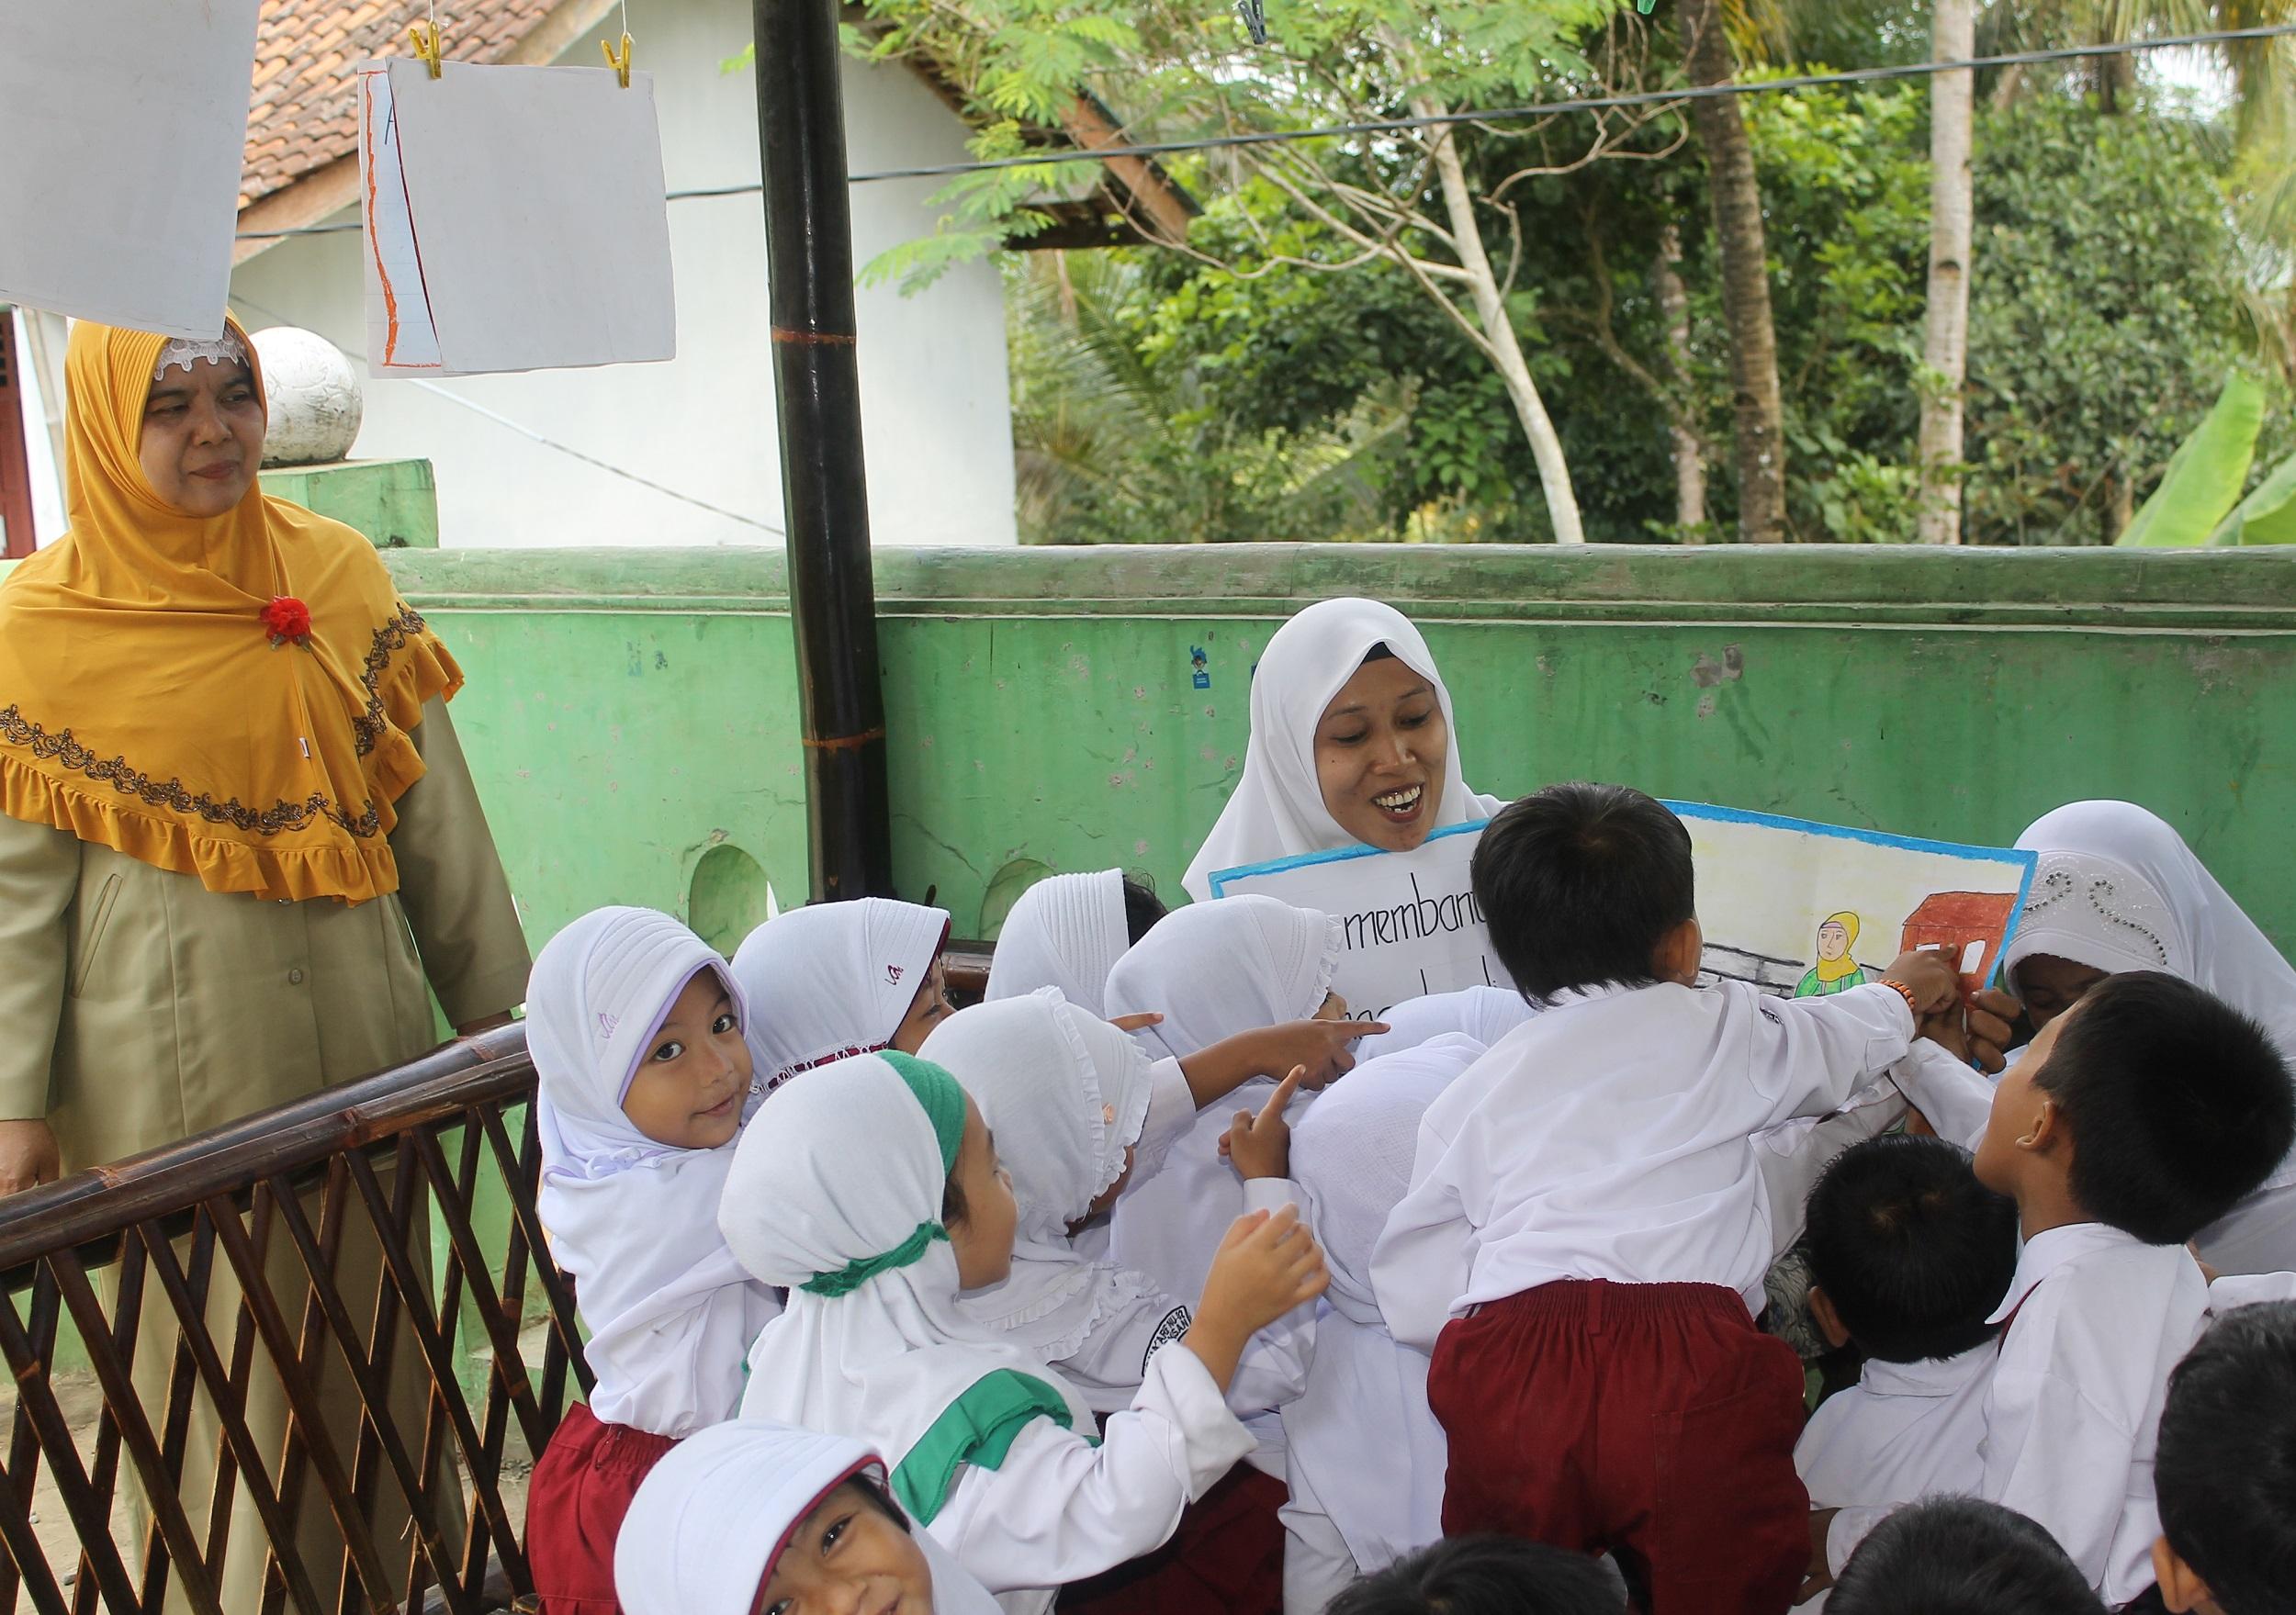 Ibu Pembuat Gula Jawa Ini Bantu Siswa Belajar Membaca  Libatkan Paguyuban Kelas untuk Dukung Program Membaca Terbimbing